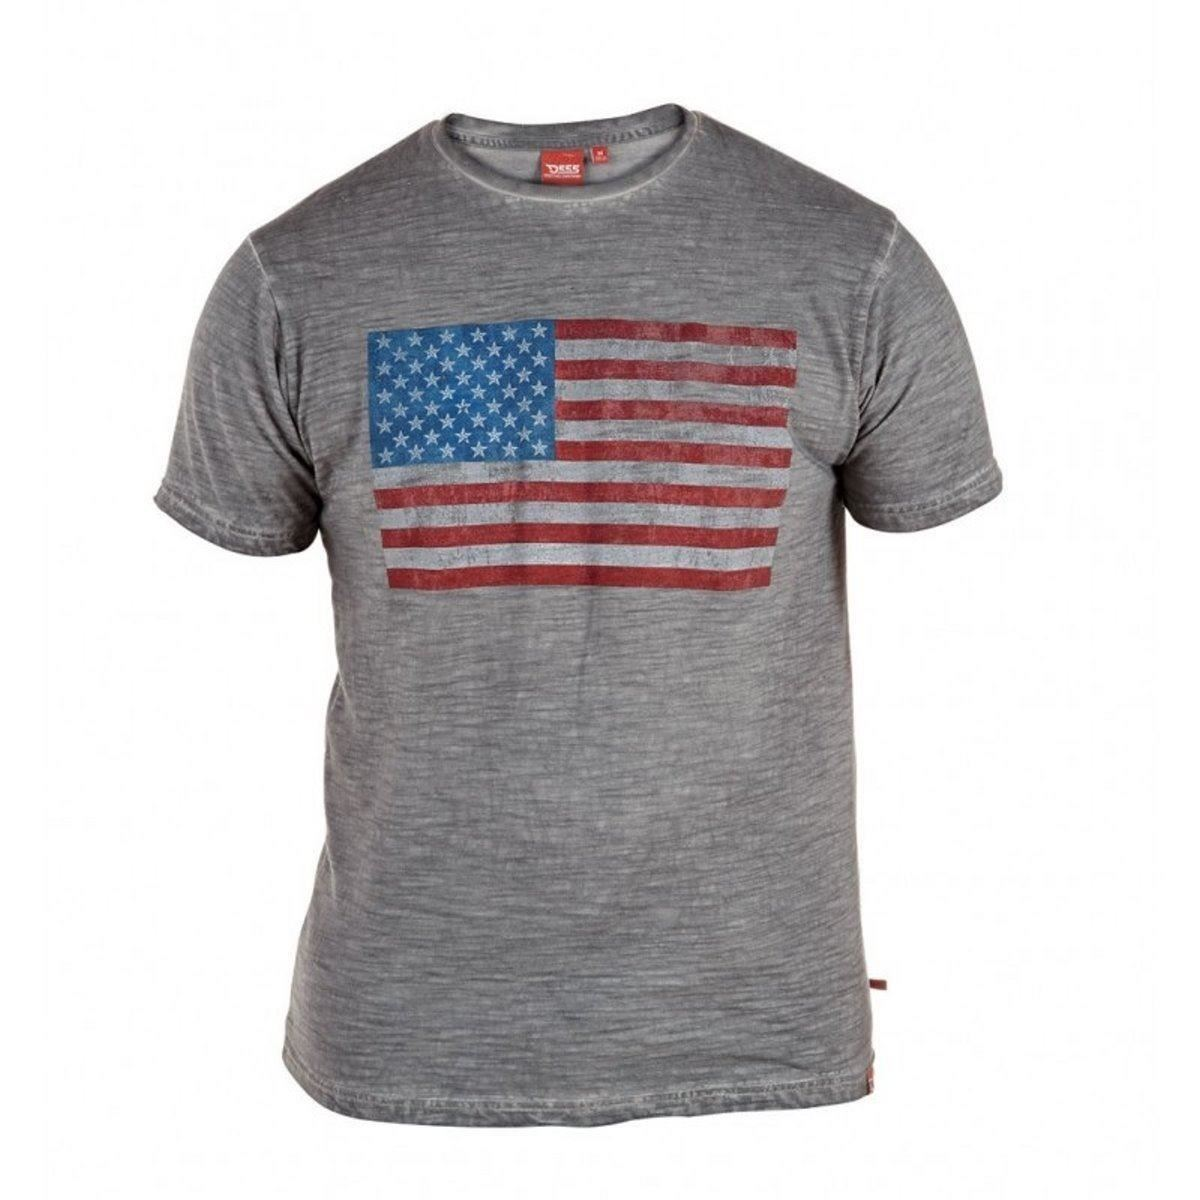 big mens king size manhattan t shirt tee new york usa flag 2xl 3xl 4xl 5xl 6xl ebay. Black Bedroom Furniture Sets. Home Design Ideas